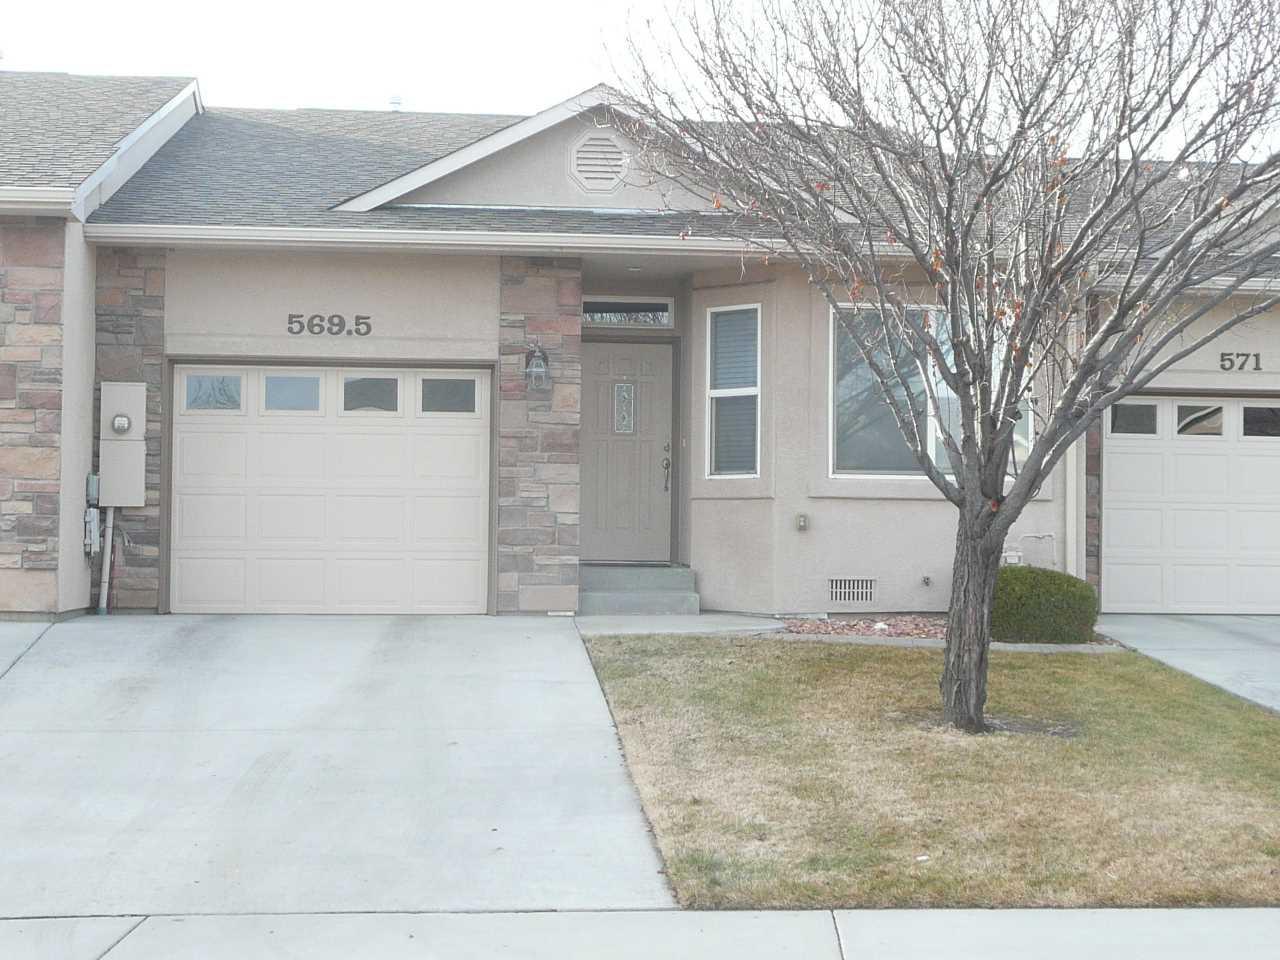 569 1/2 Garden Grove Court, Grand Junction, CO 81501